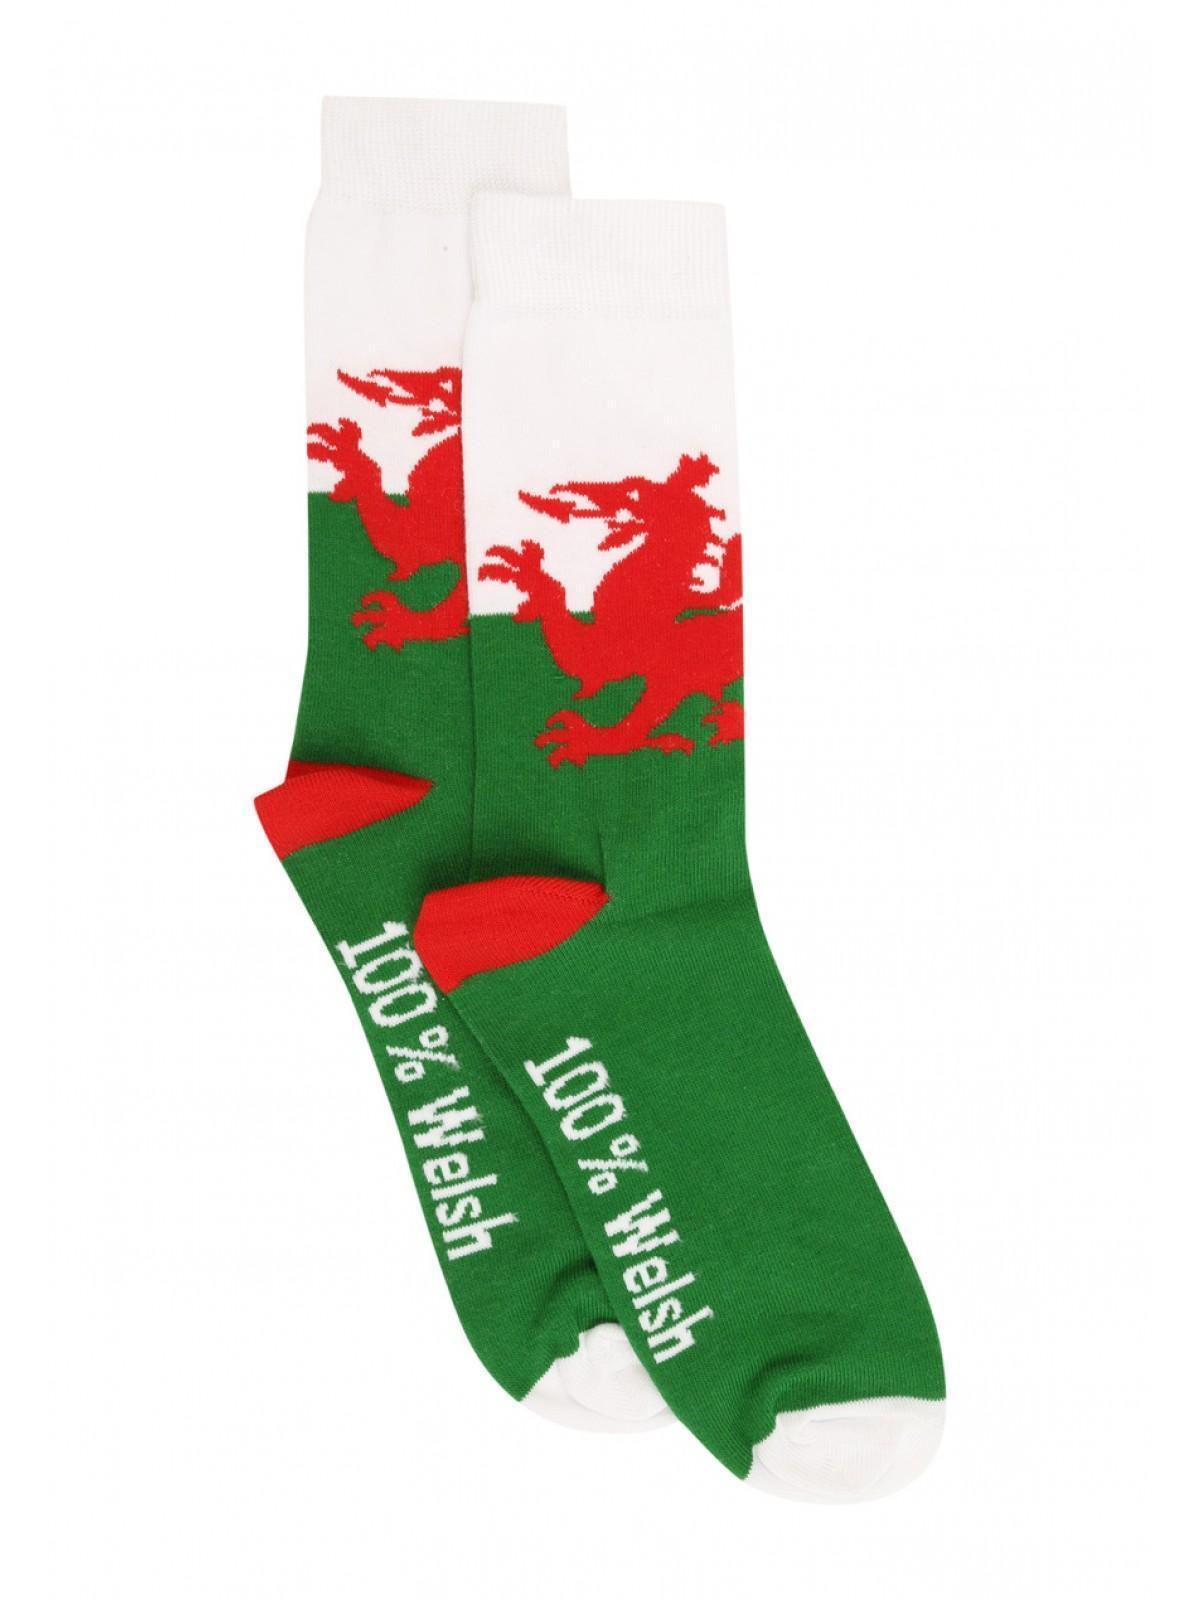 Mens Novelty Wales Socks